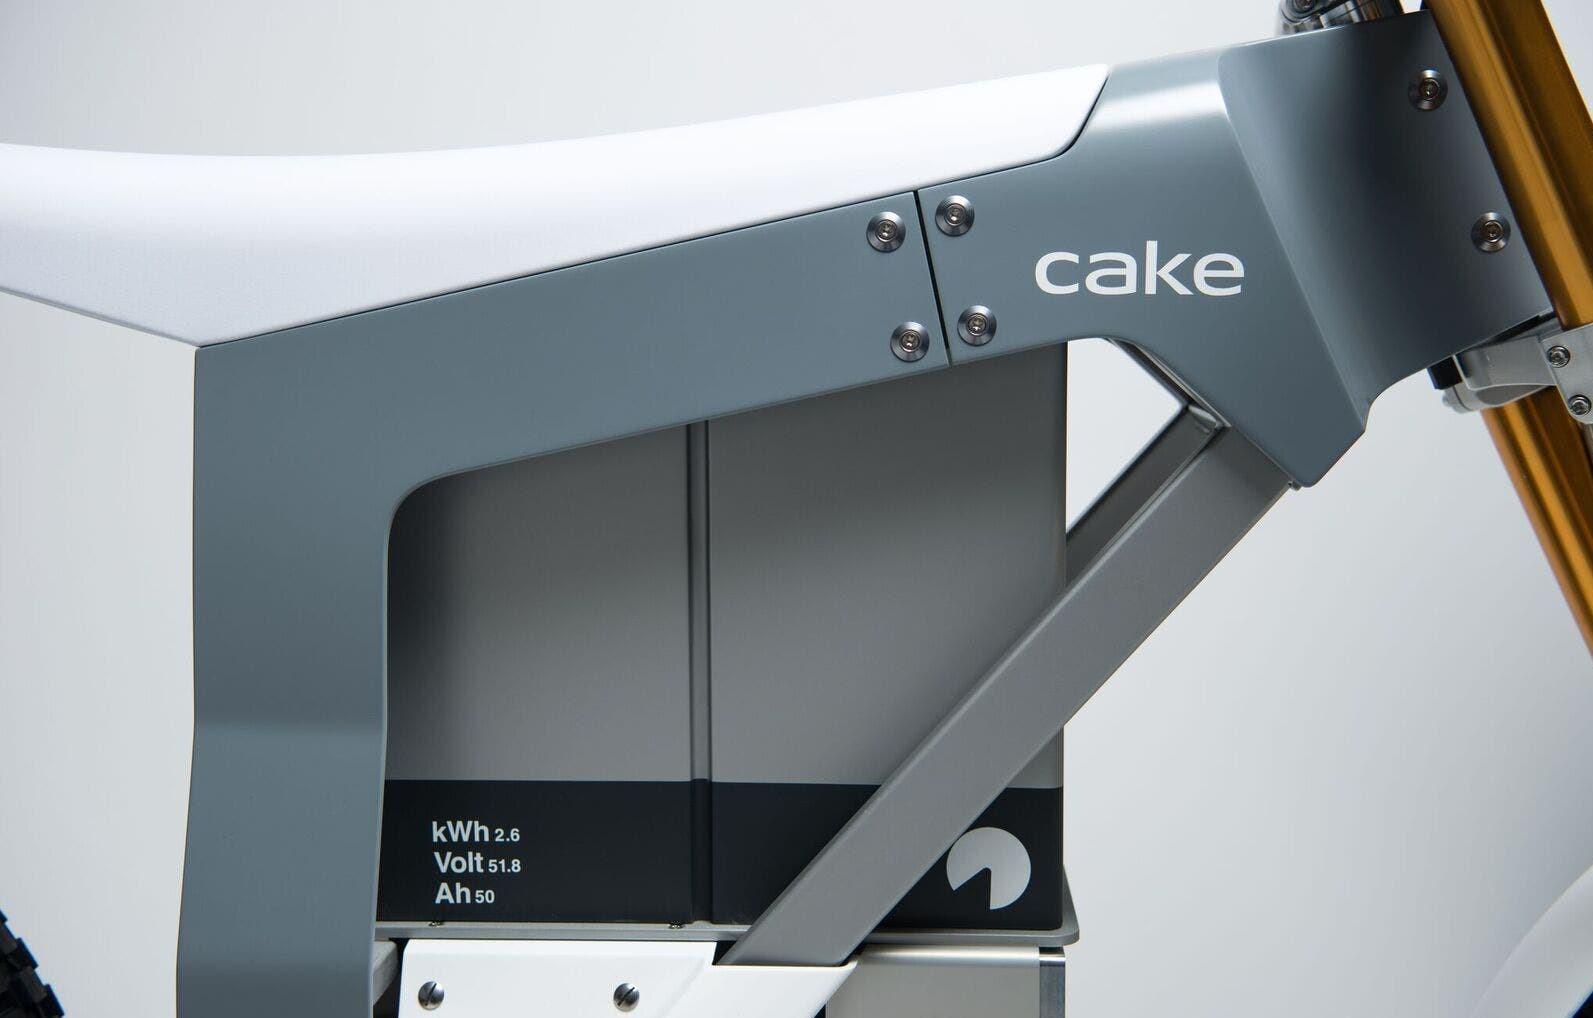 Cake Kalk O Electric Motorcycle Battery